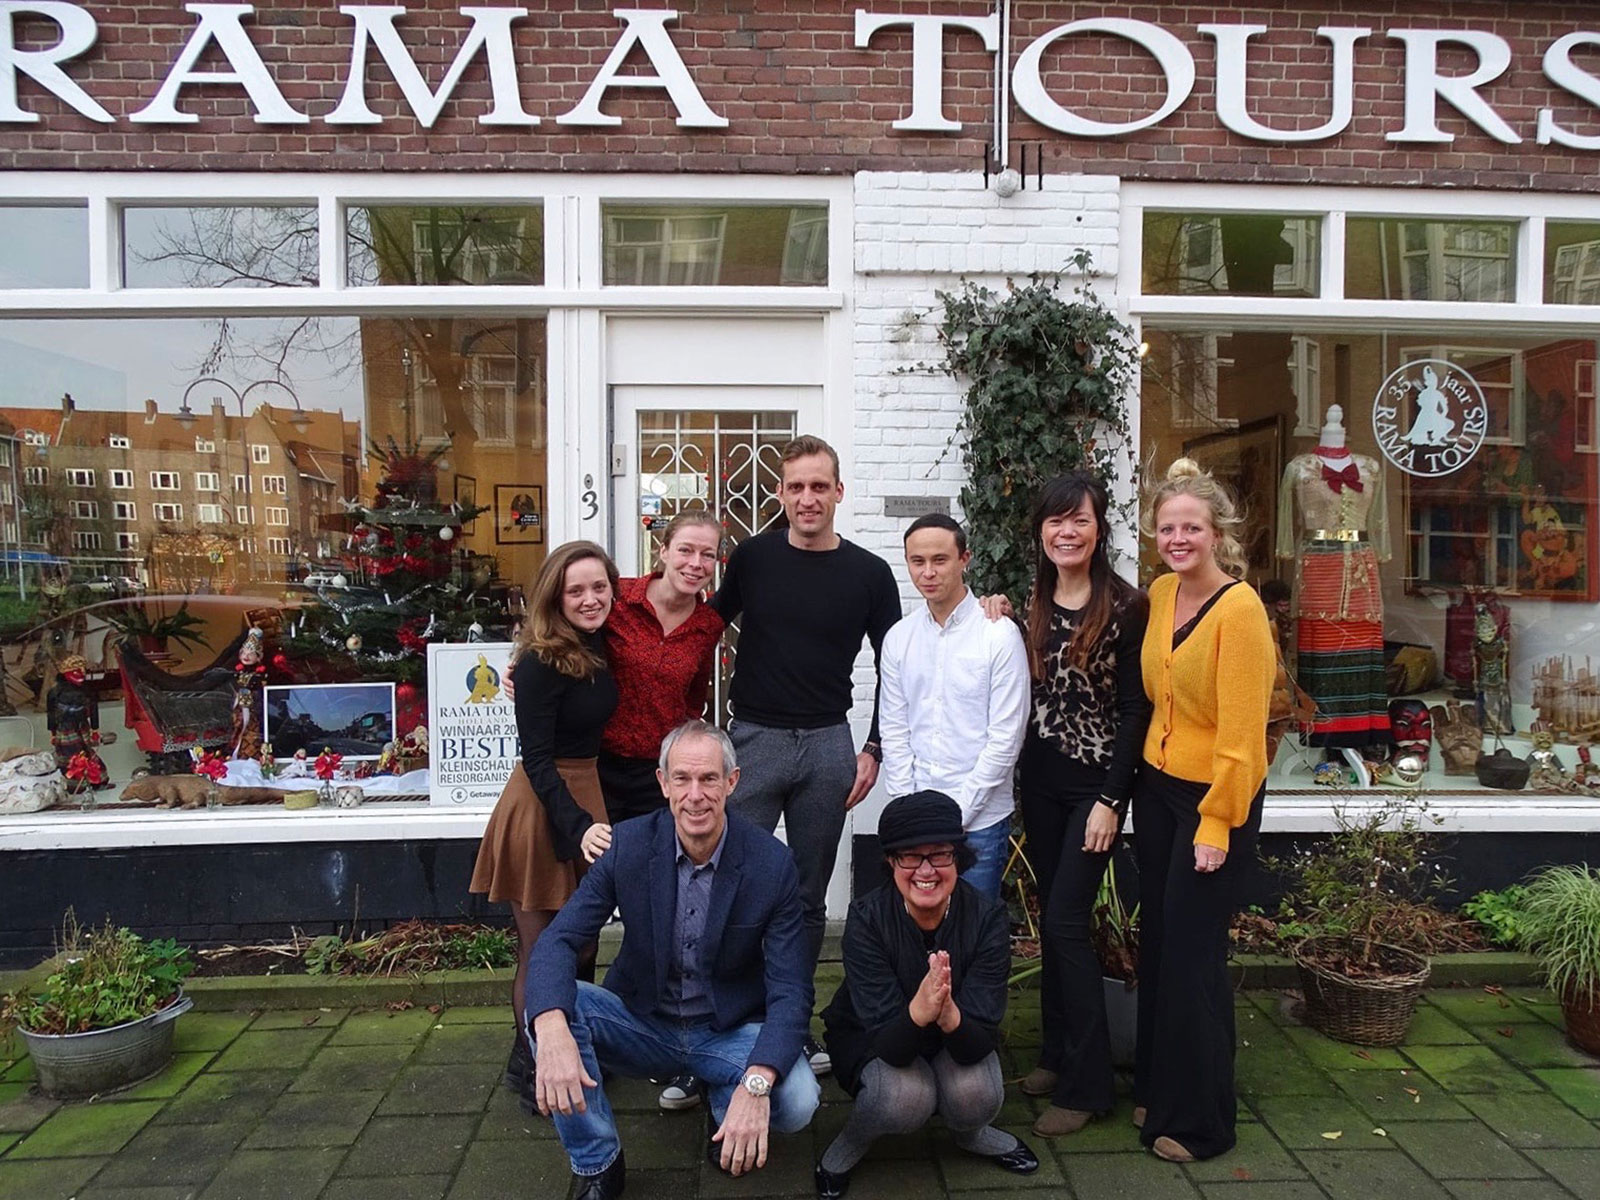 rama tours holland 35 jaar in 2020 blog 2